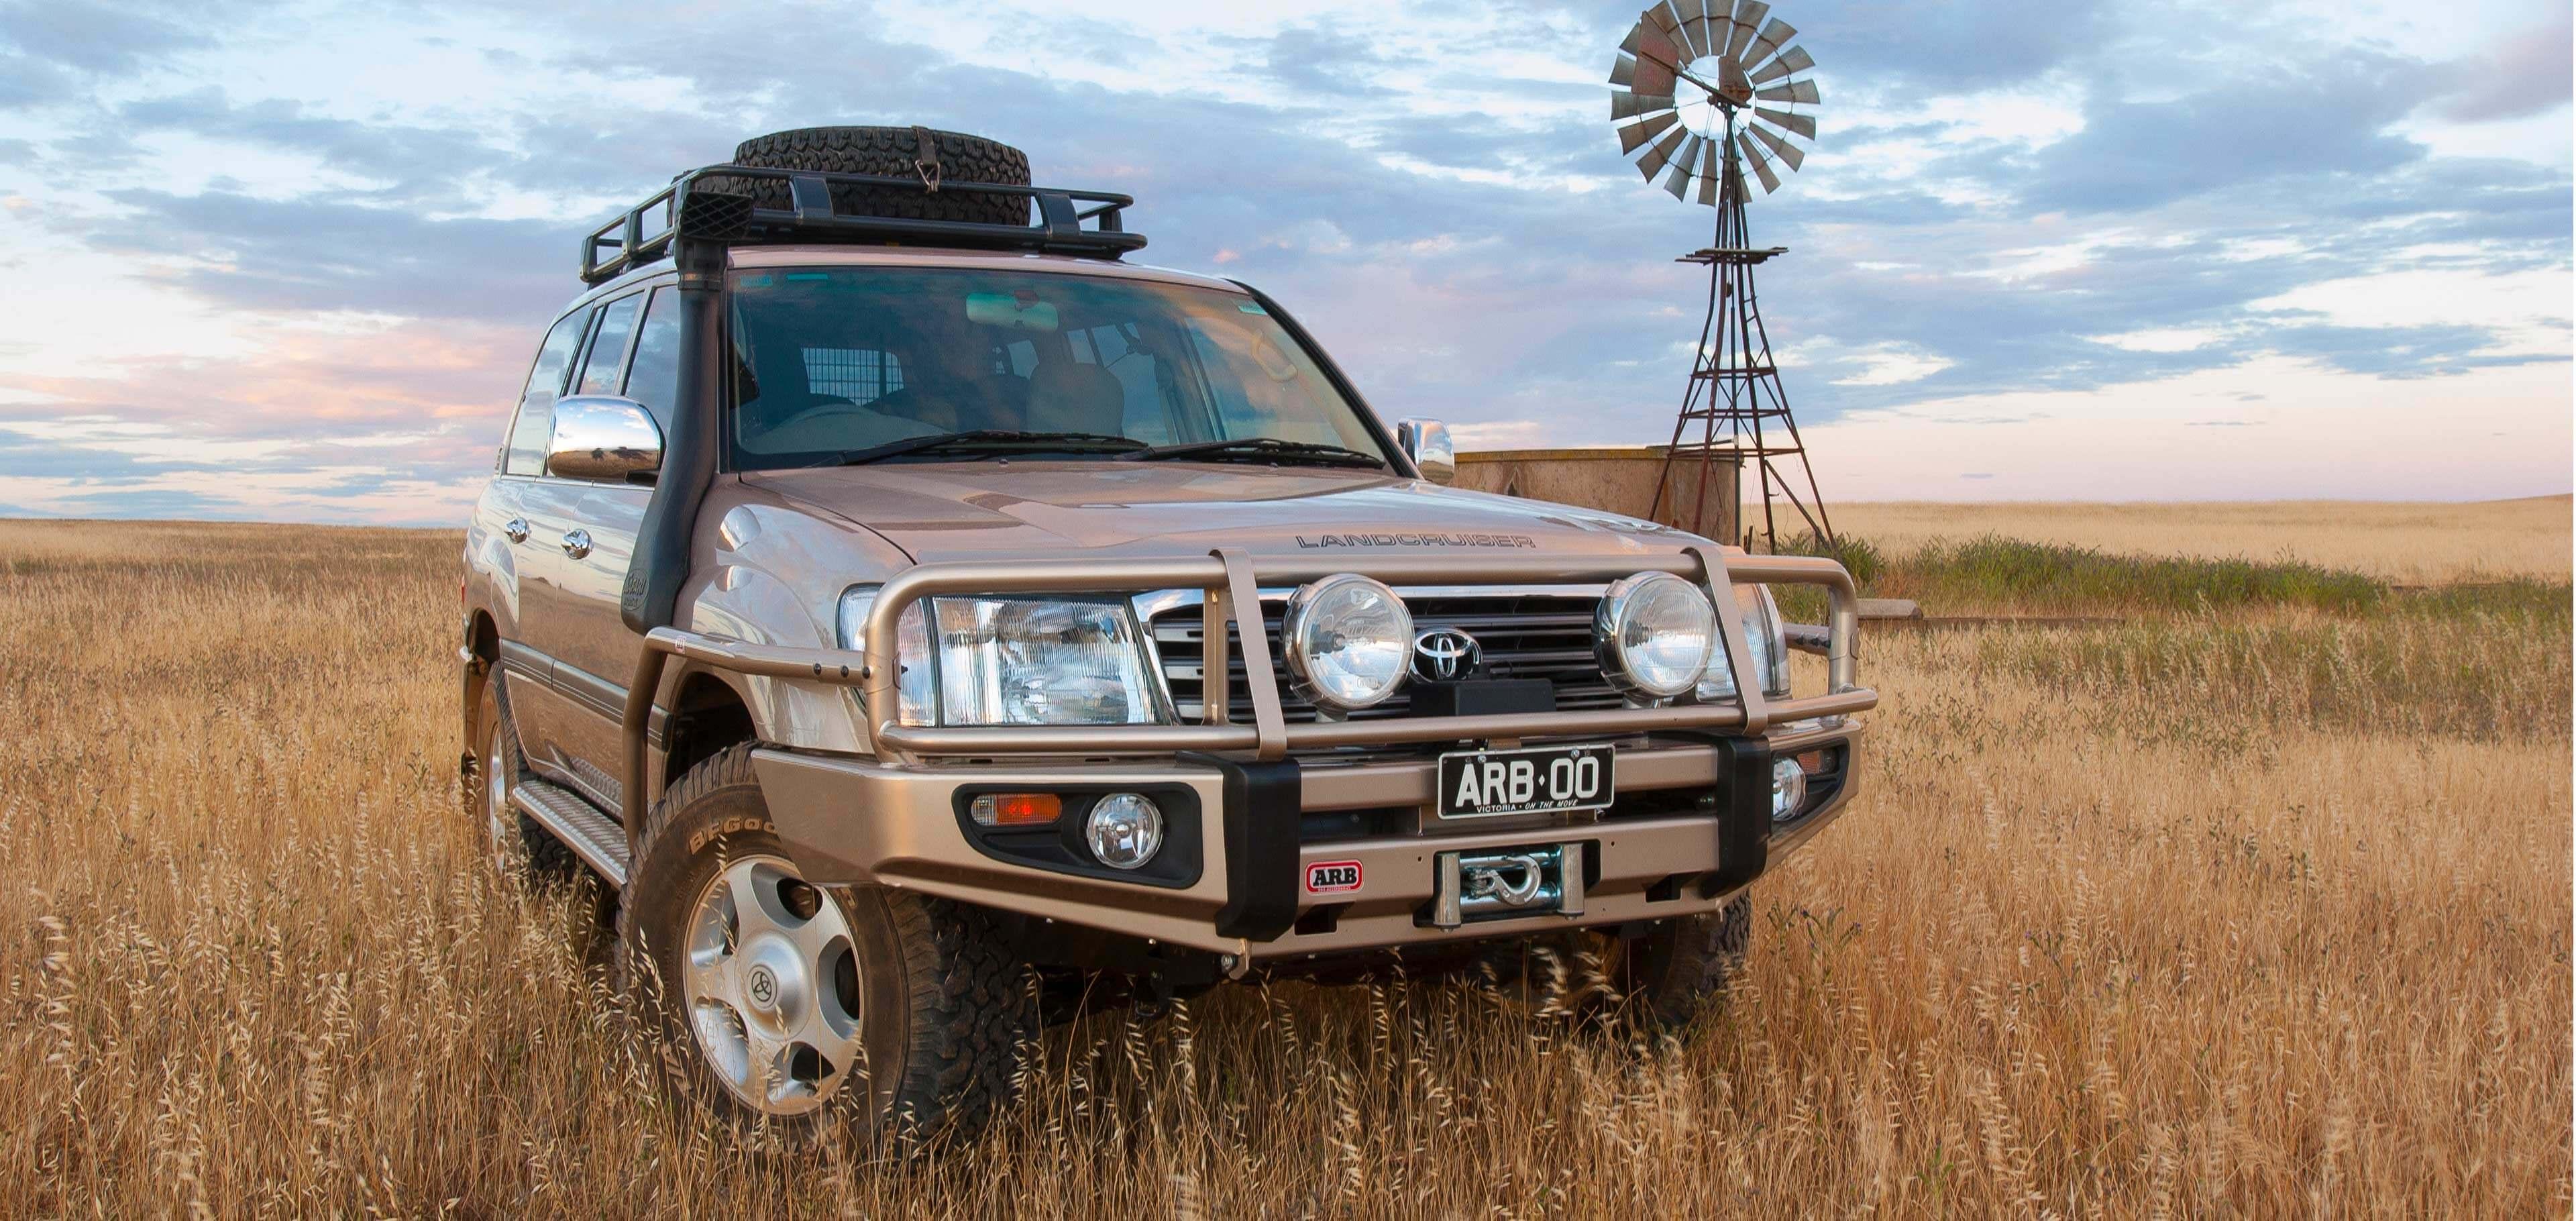 Kelebihan Toyota Land Cruiser 100 Murah Berkualitas